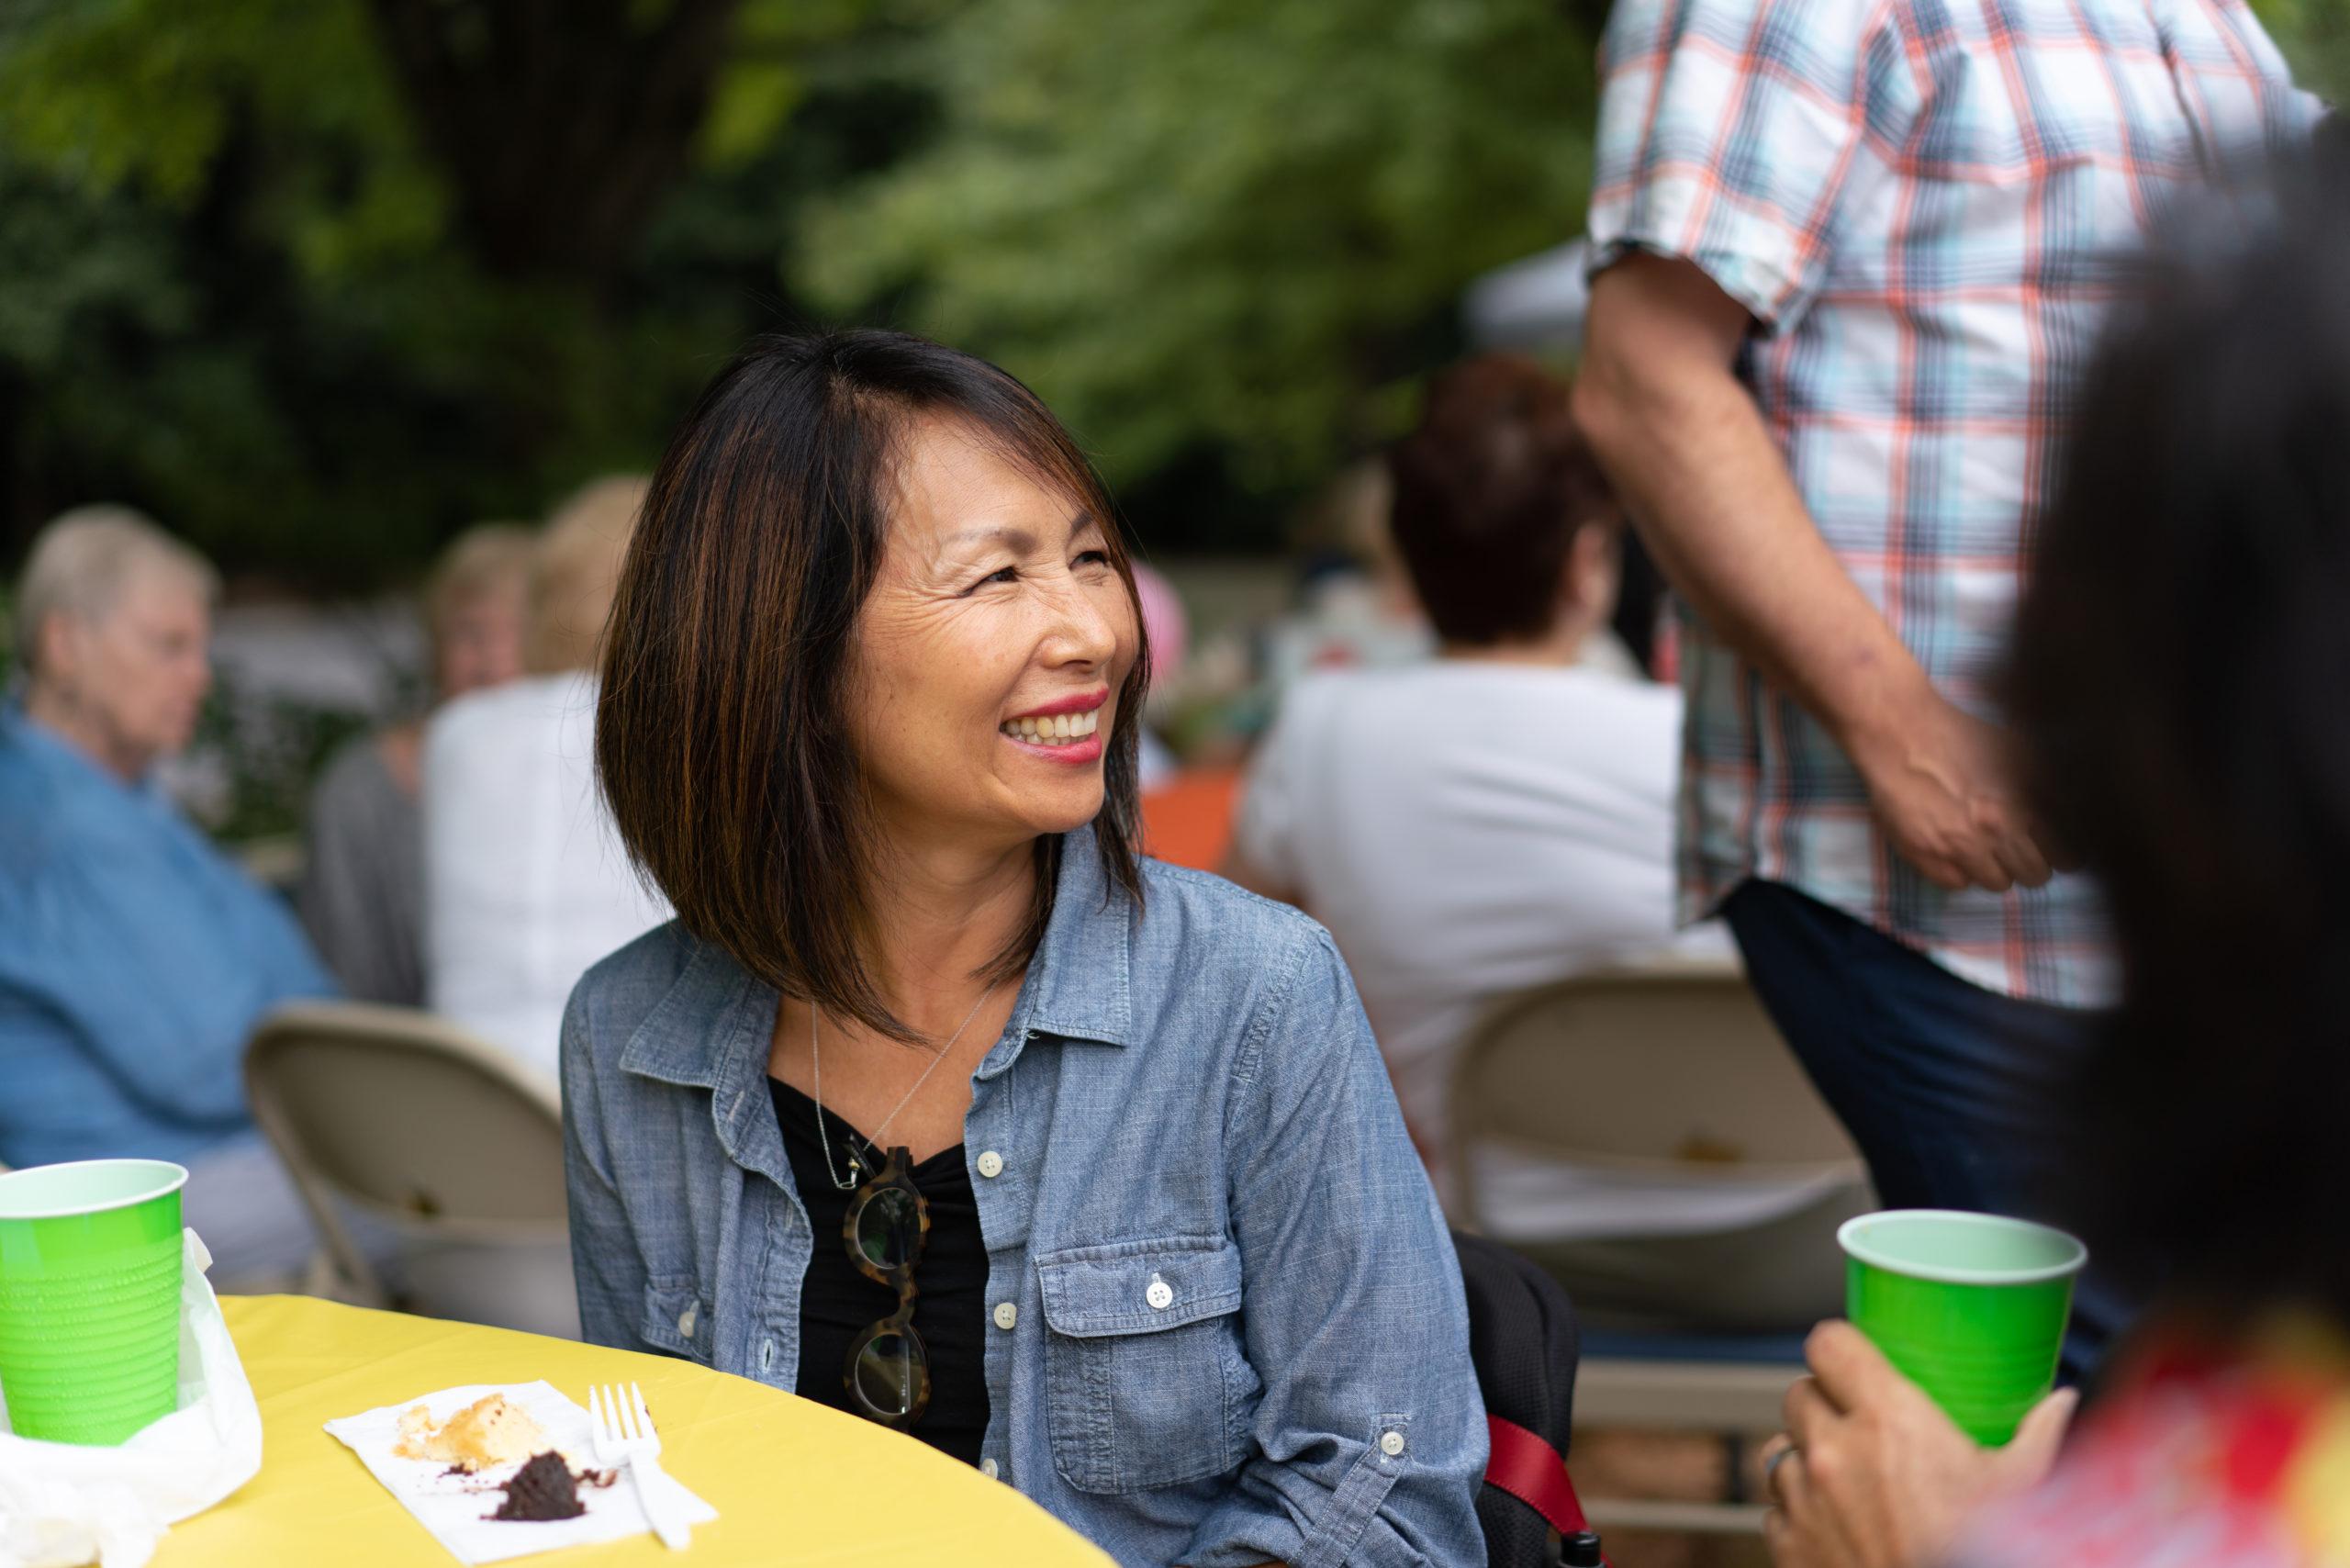 Woman in denim jacket smiling at church picnic